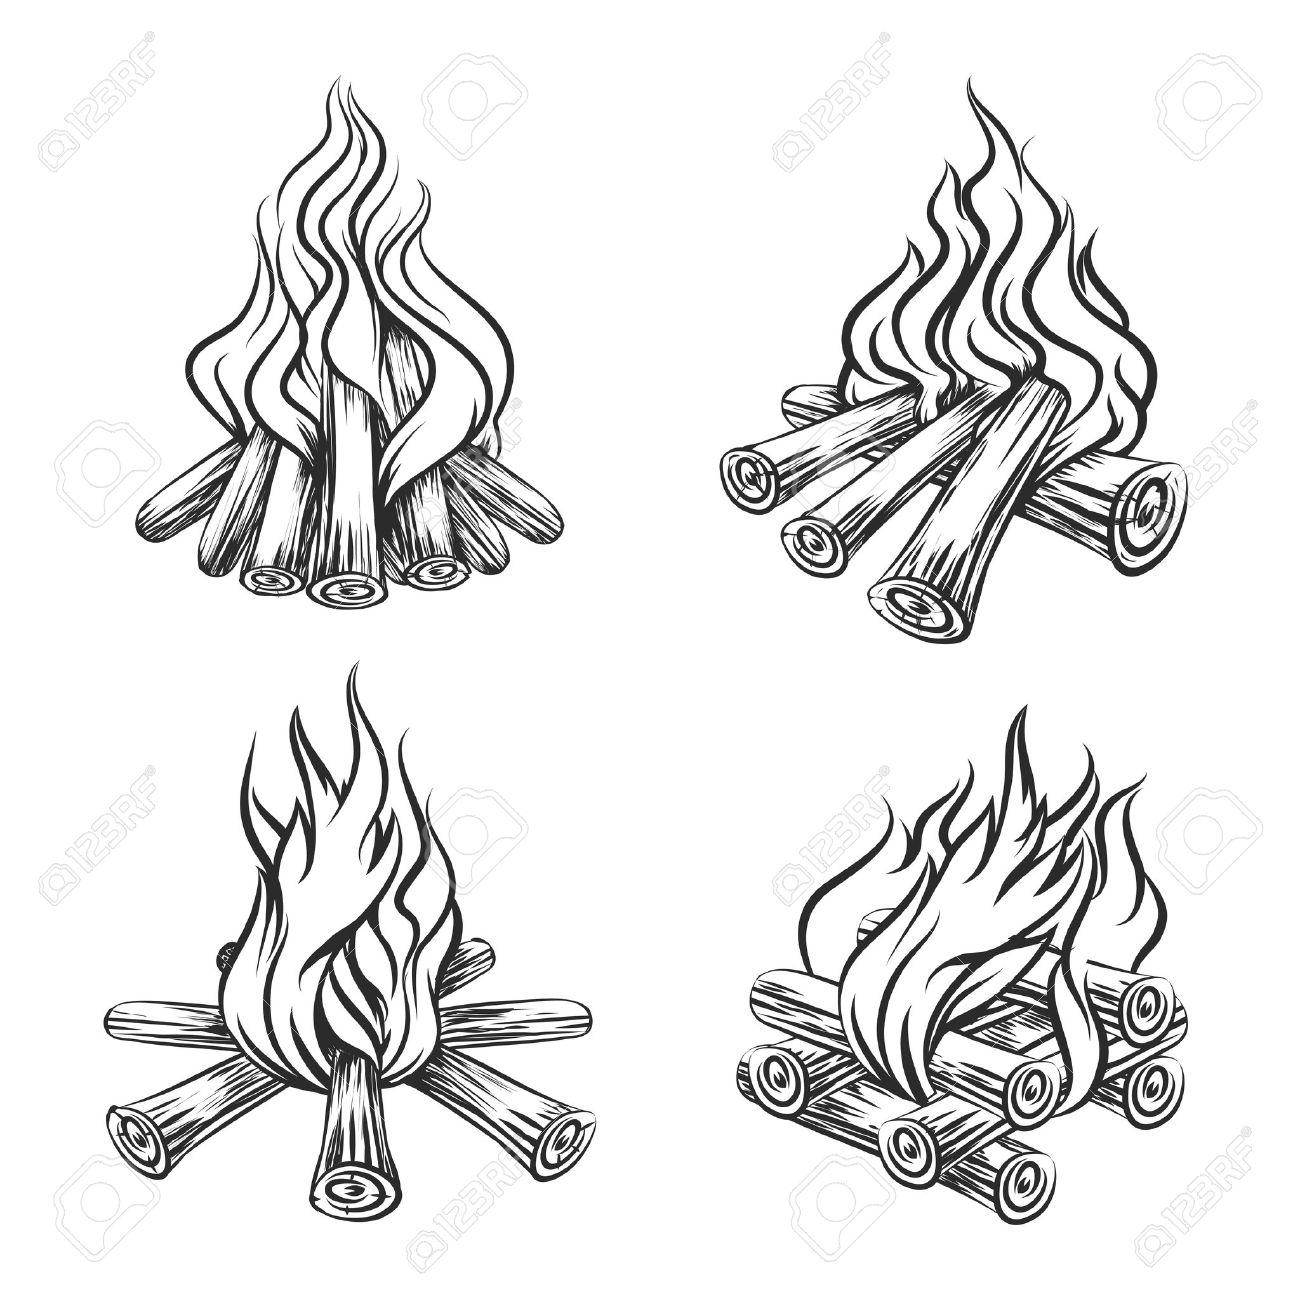 Realistic Flames Drawing At Getdrawings